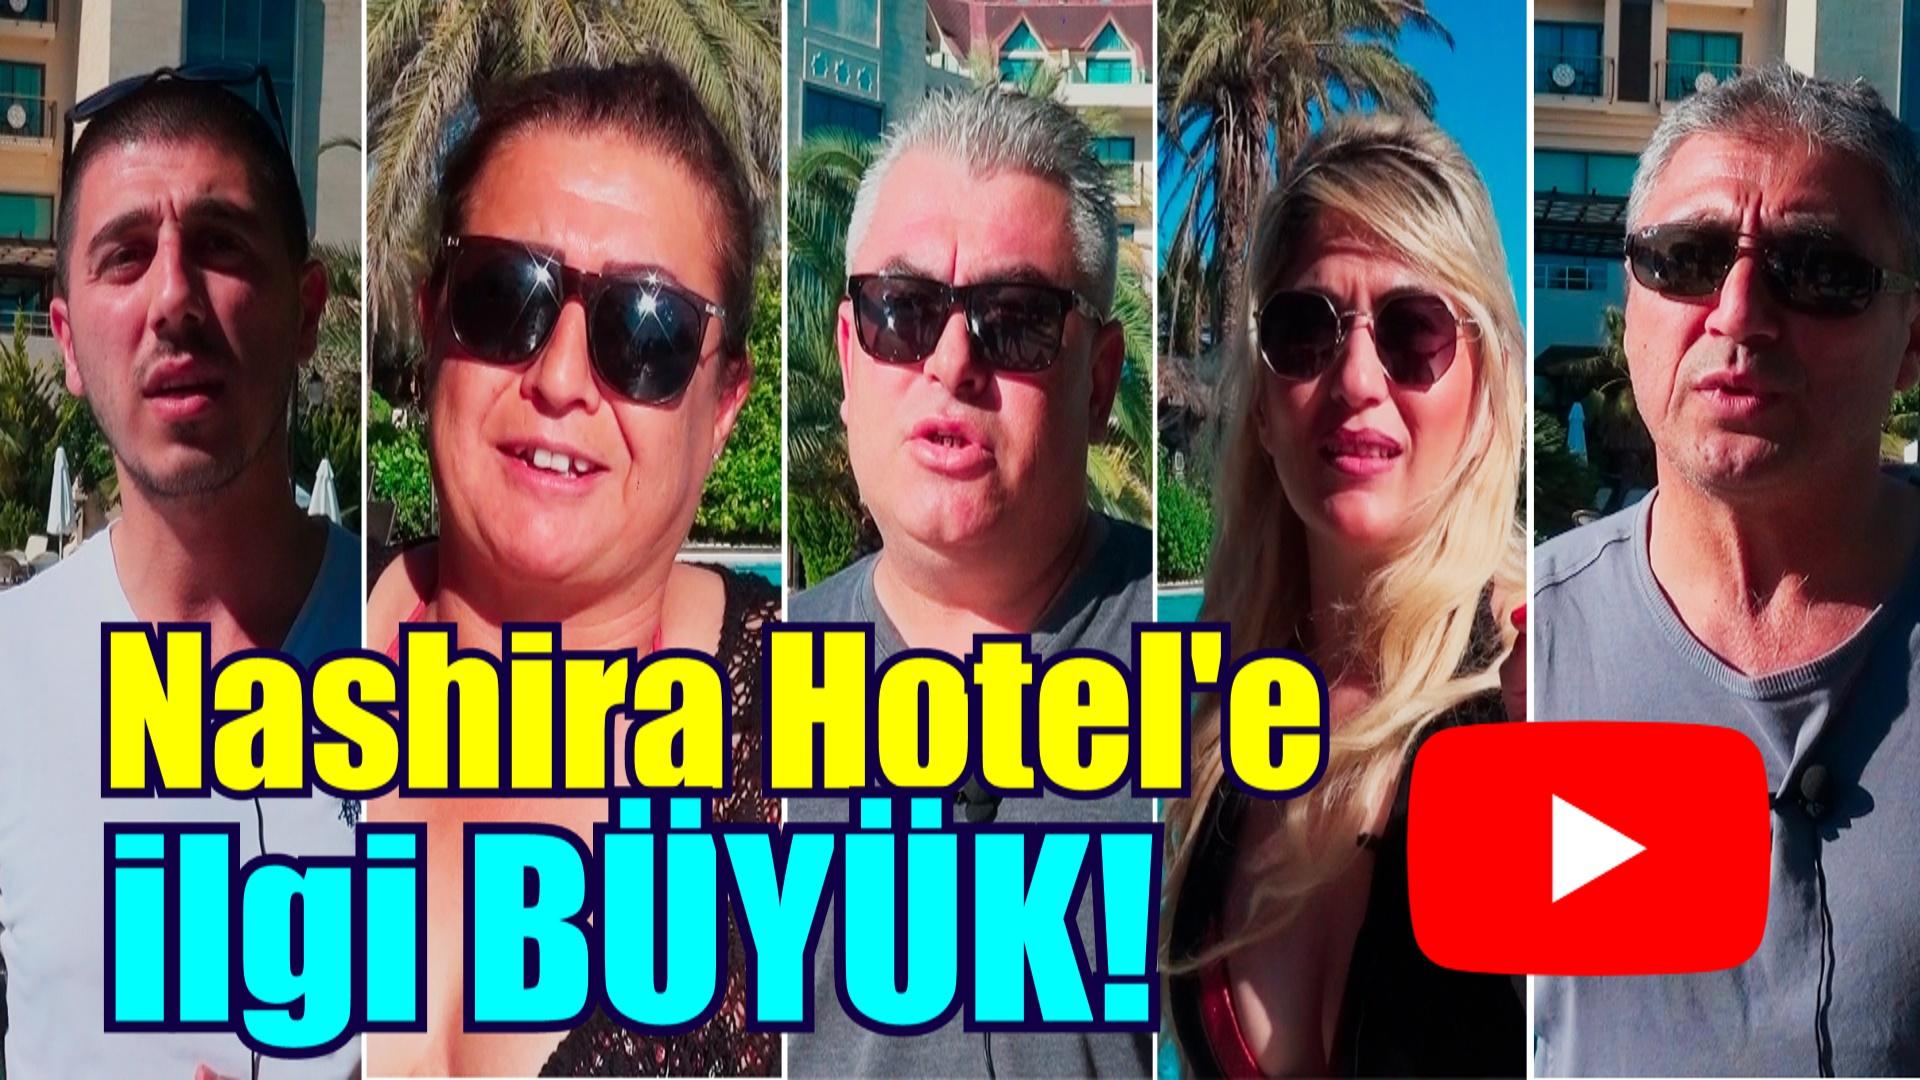 Nashira Hotel'e ilgi büyük!